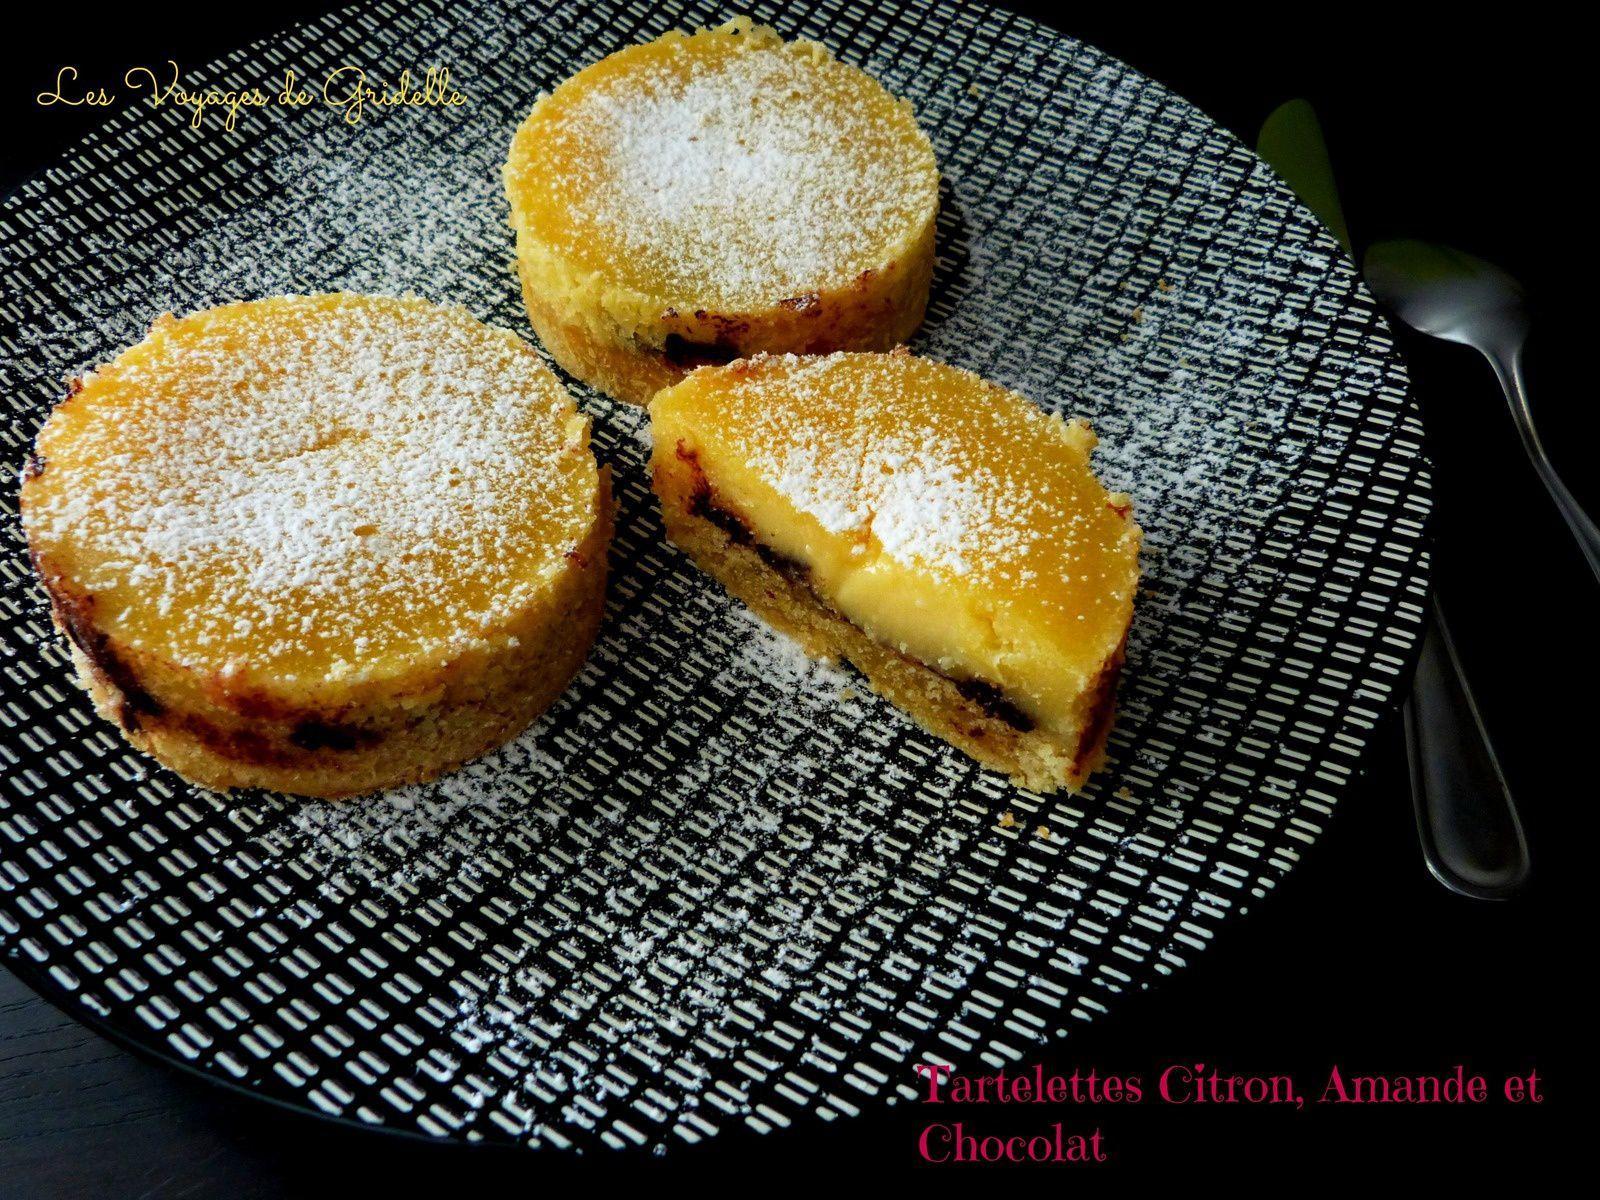 Tartelettes Citron Amande et Chocolat